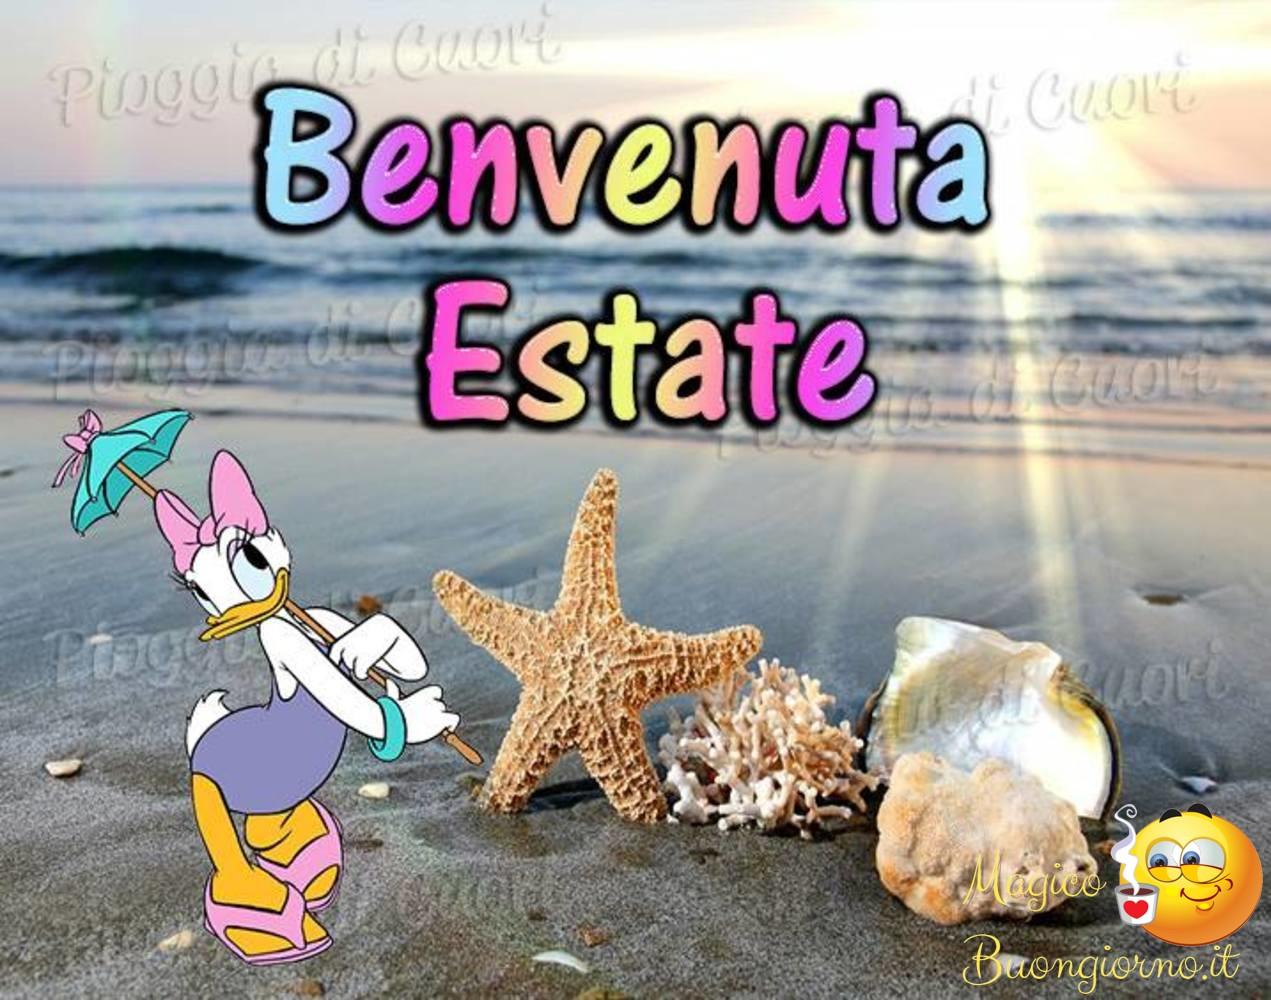 Benvenuta Estate Immagini Facebook Whatsapp 8